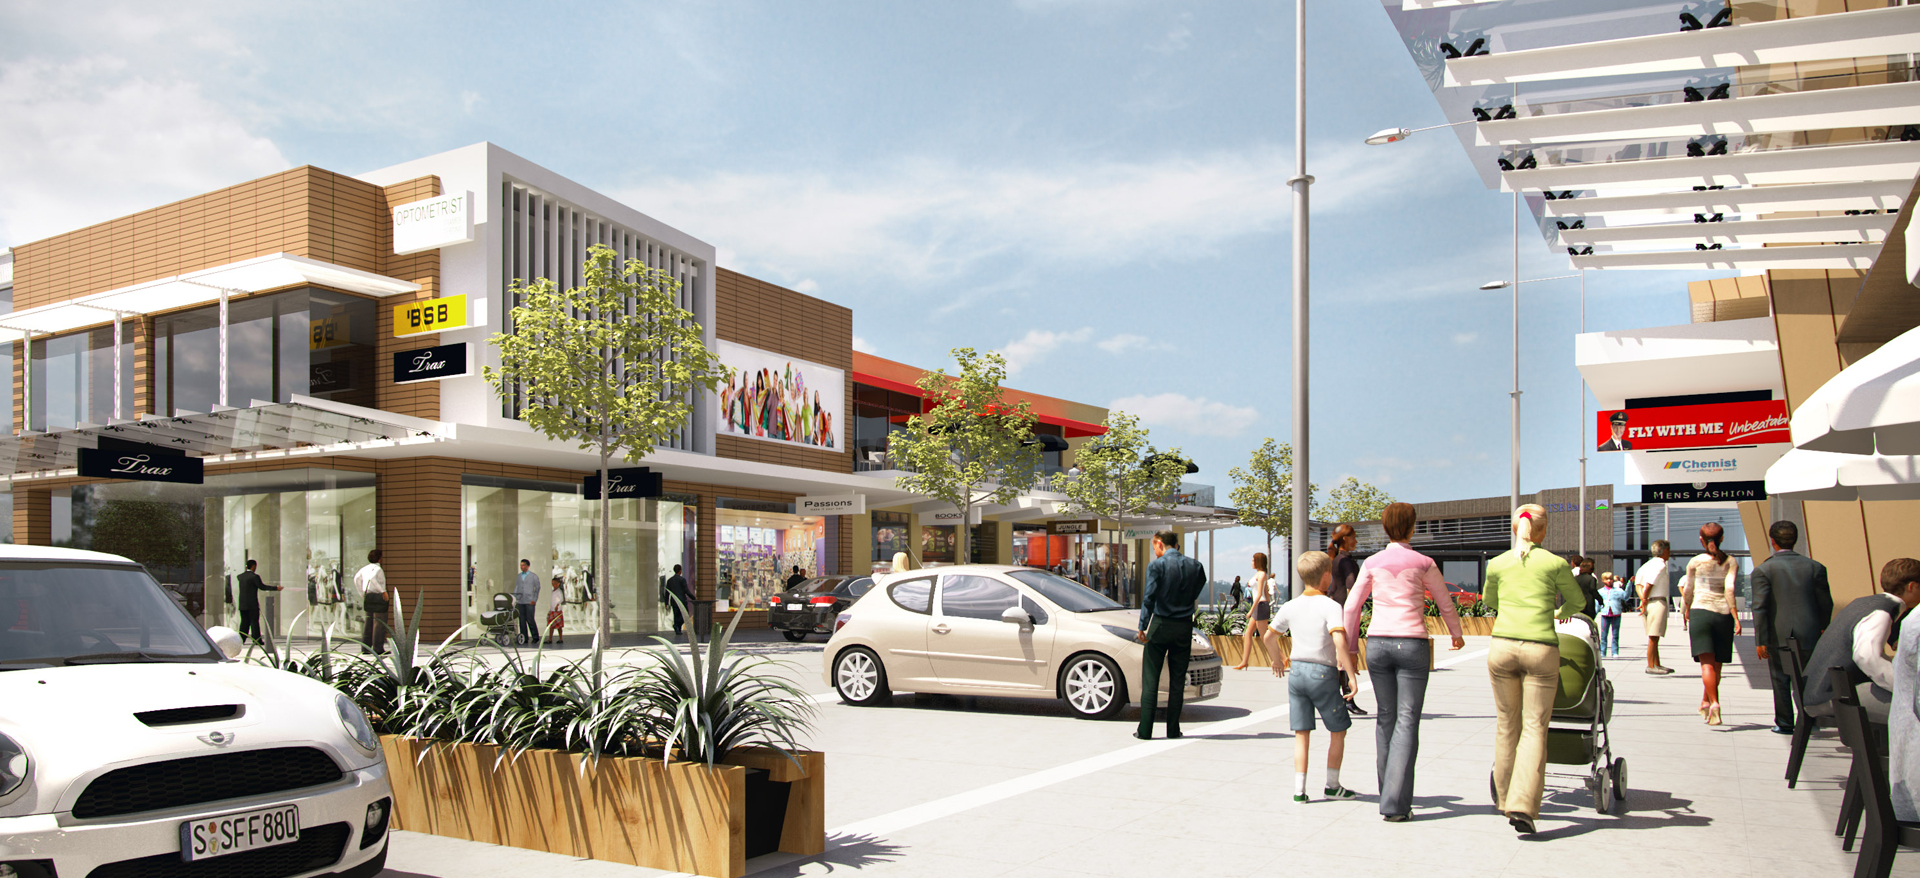 Lucas Lane Retail Precinct, Auckland